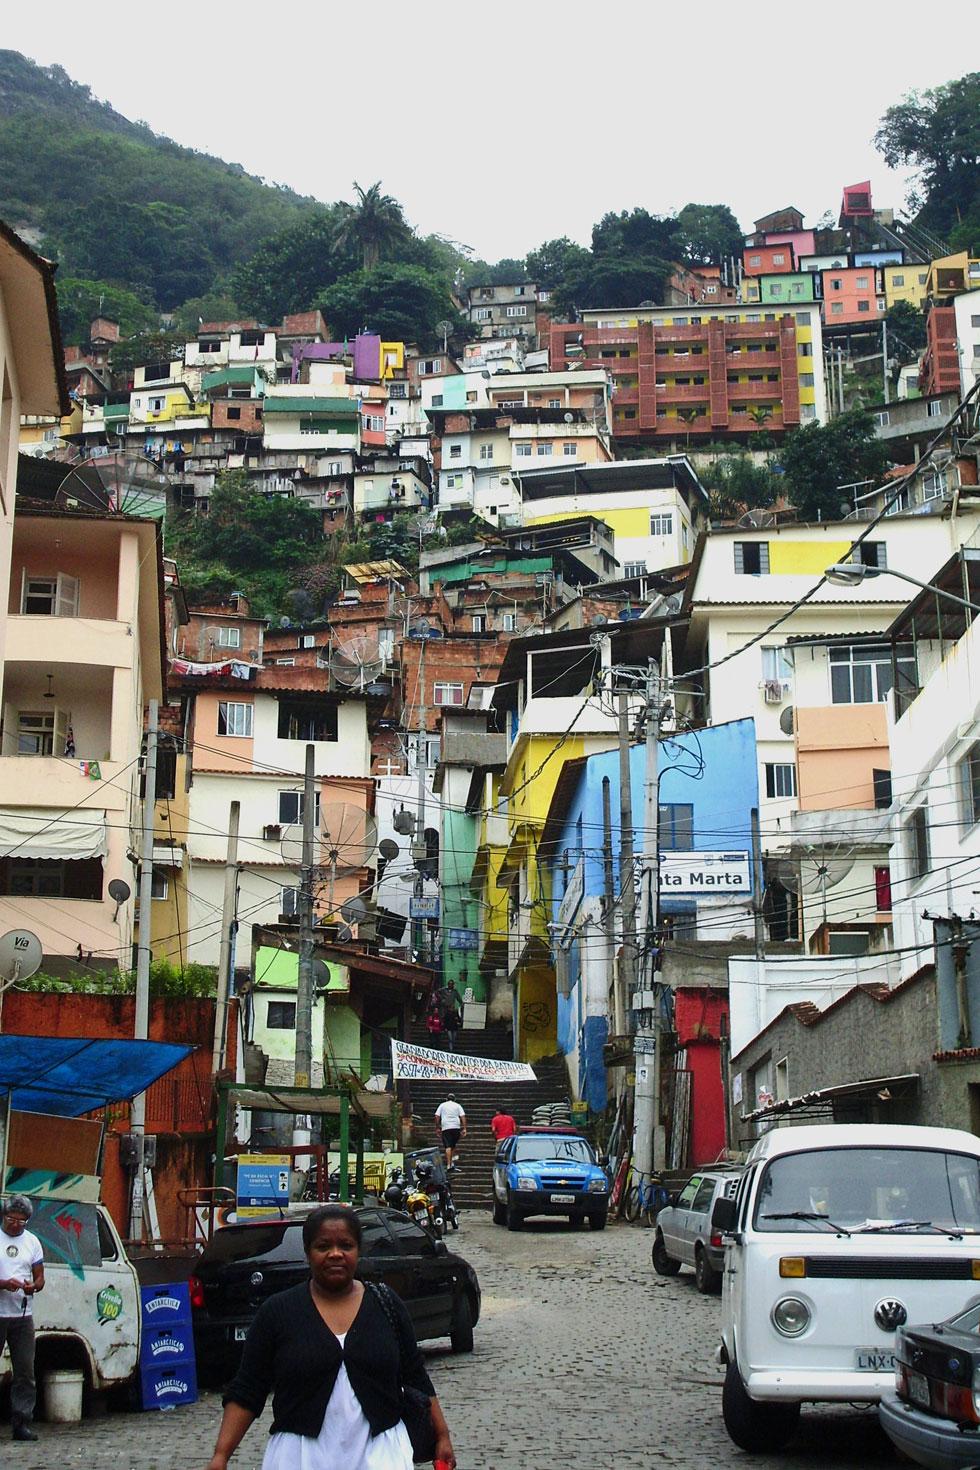 favela-landscape-copyright-